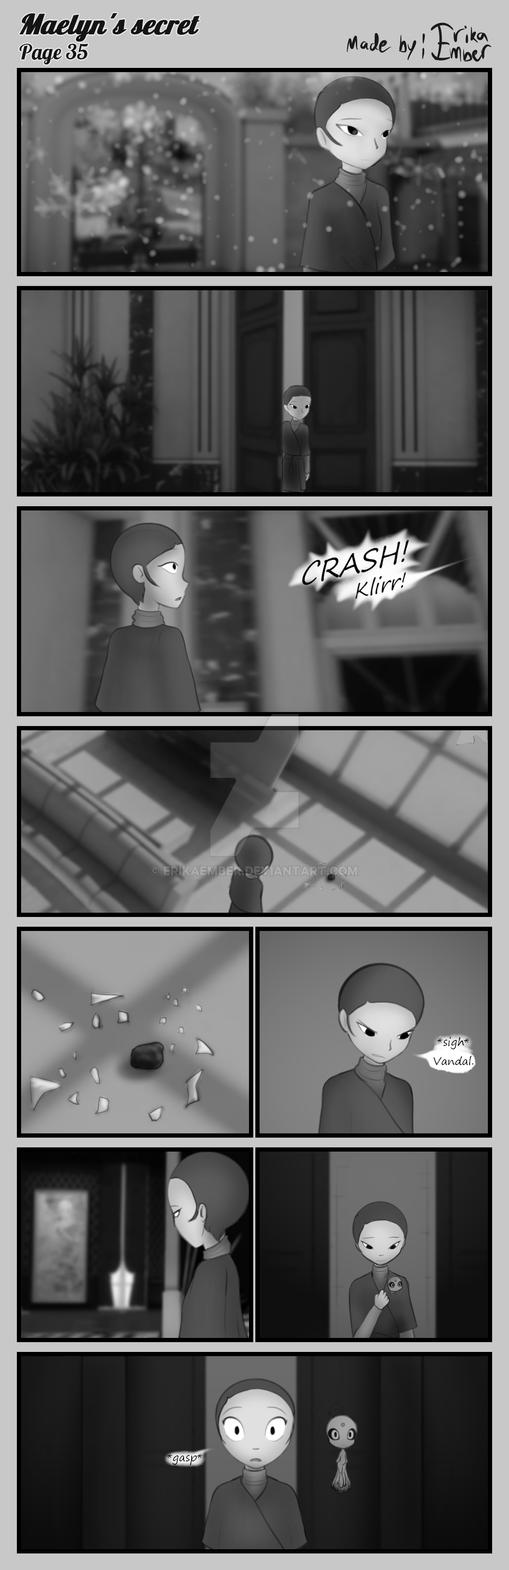 Maelyn's Secret - Page 35